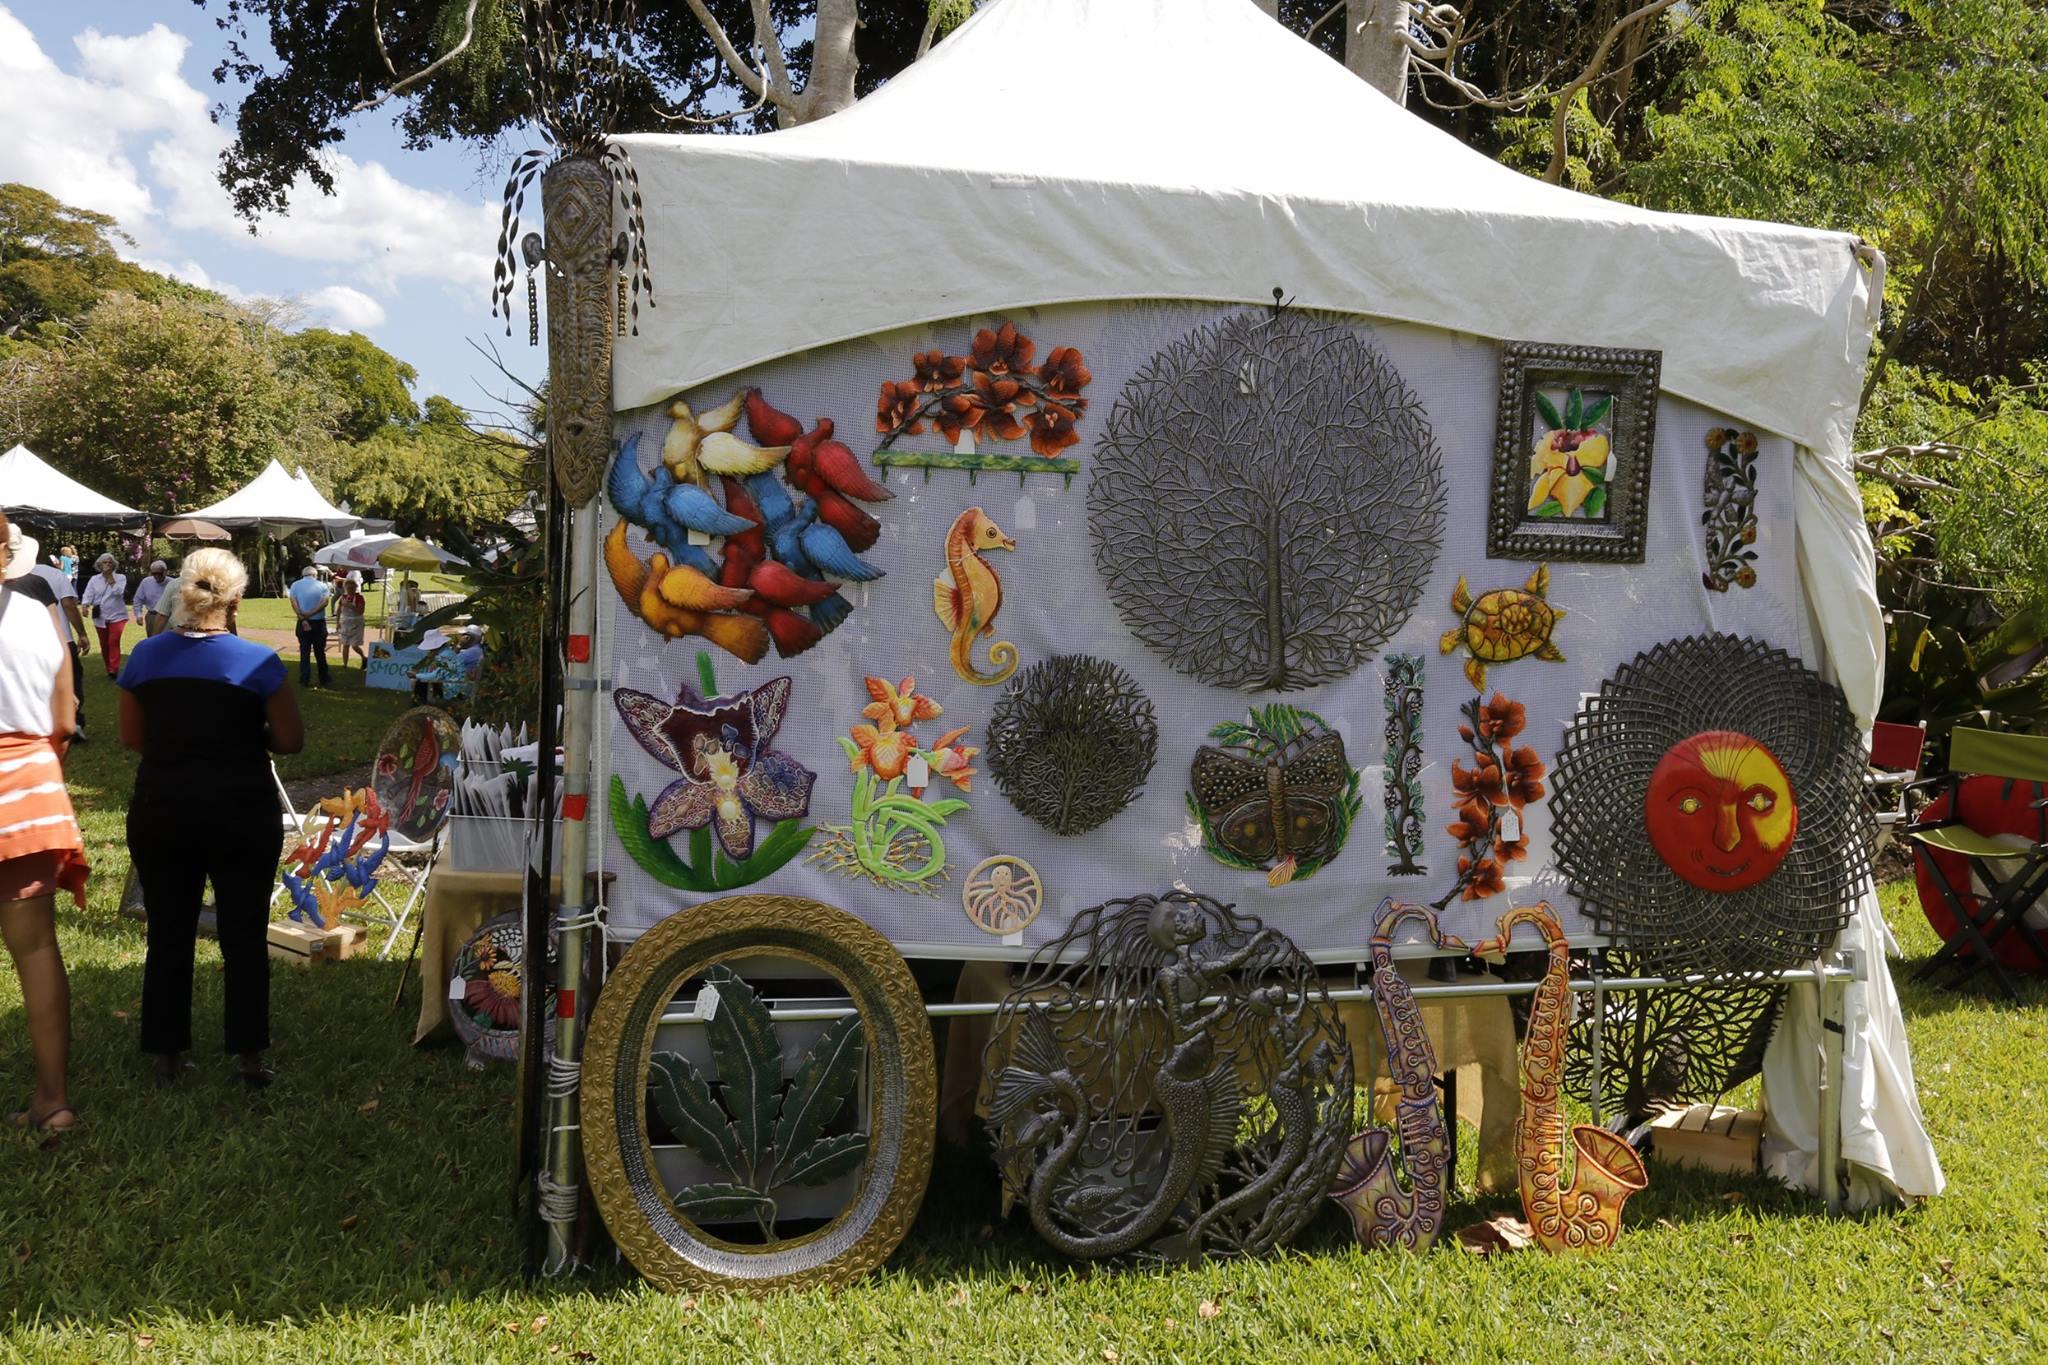 Fairchild Tropical Botanic Garden Fairchild